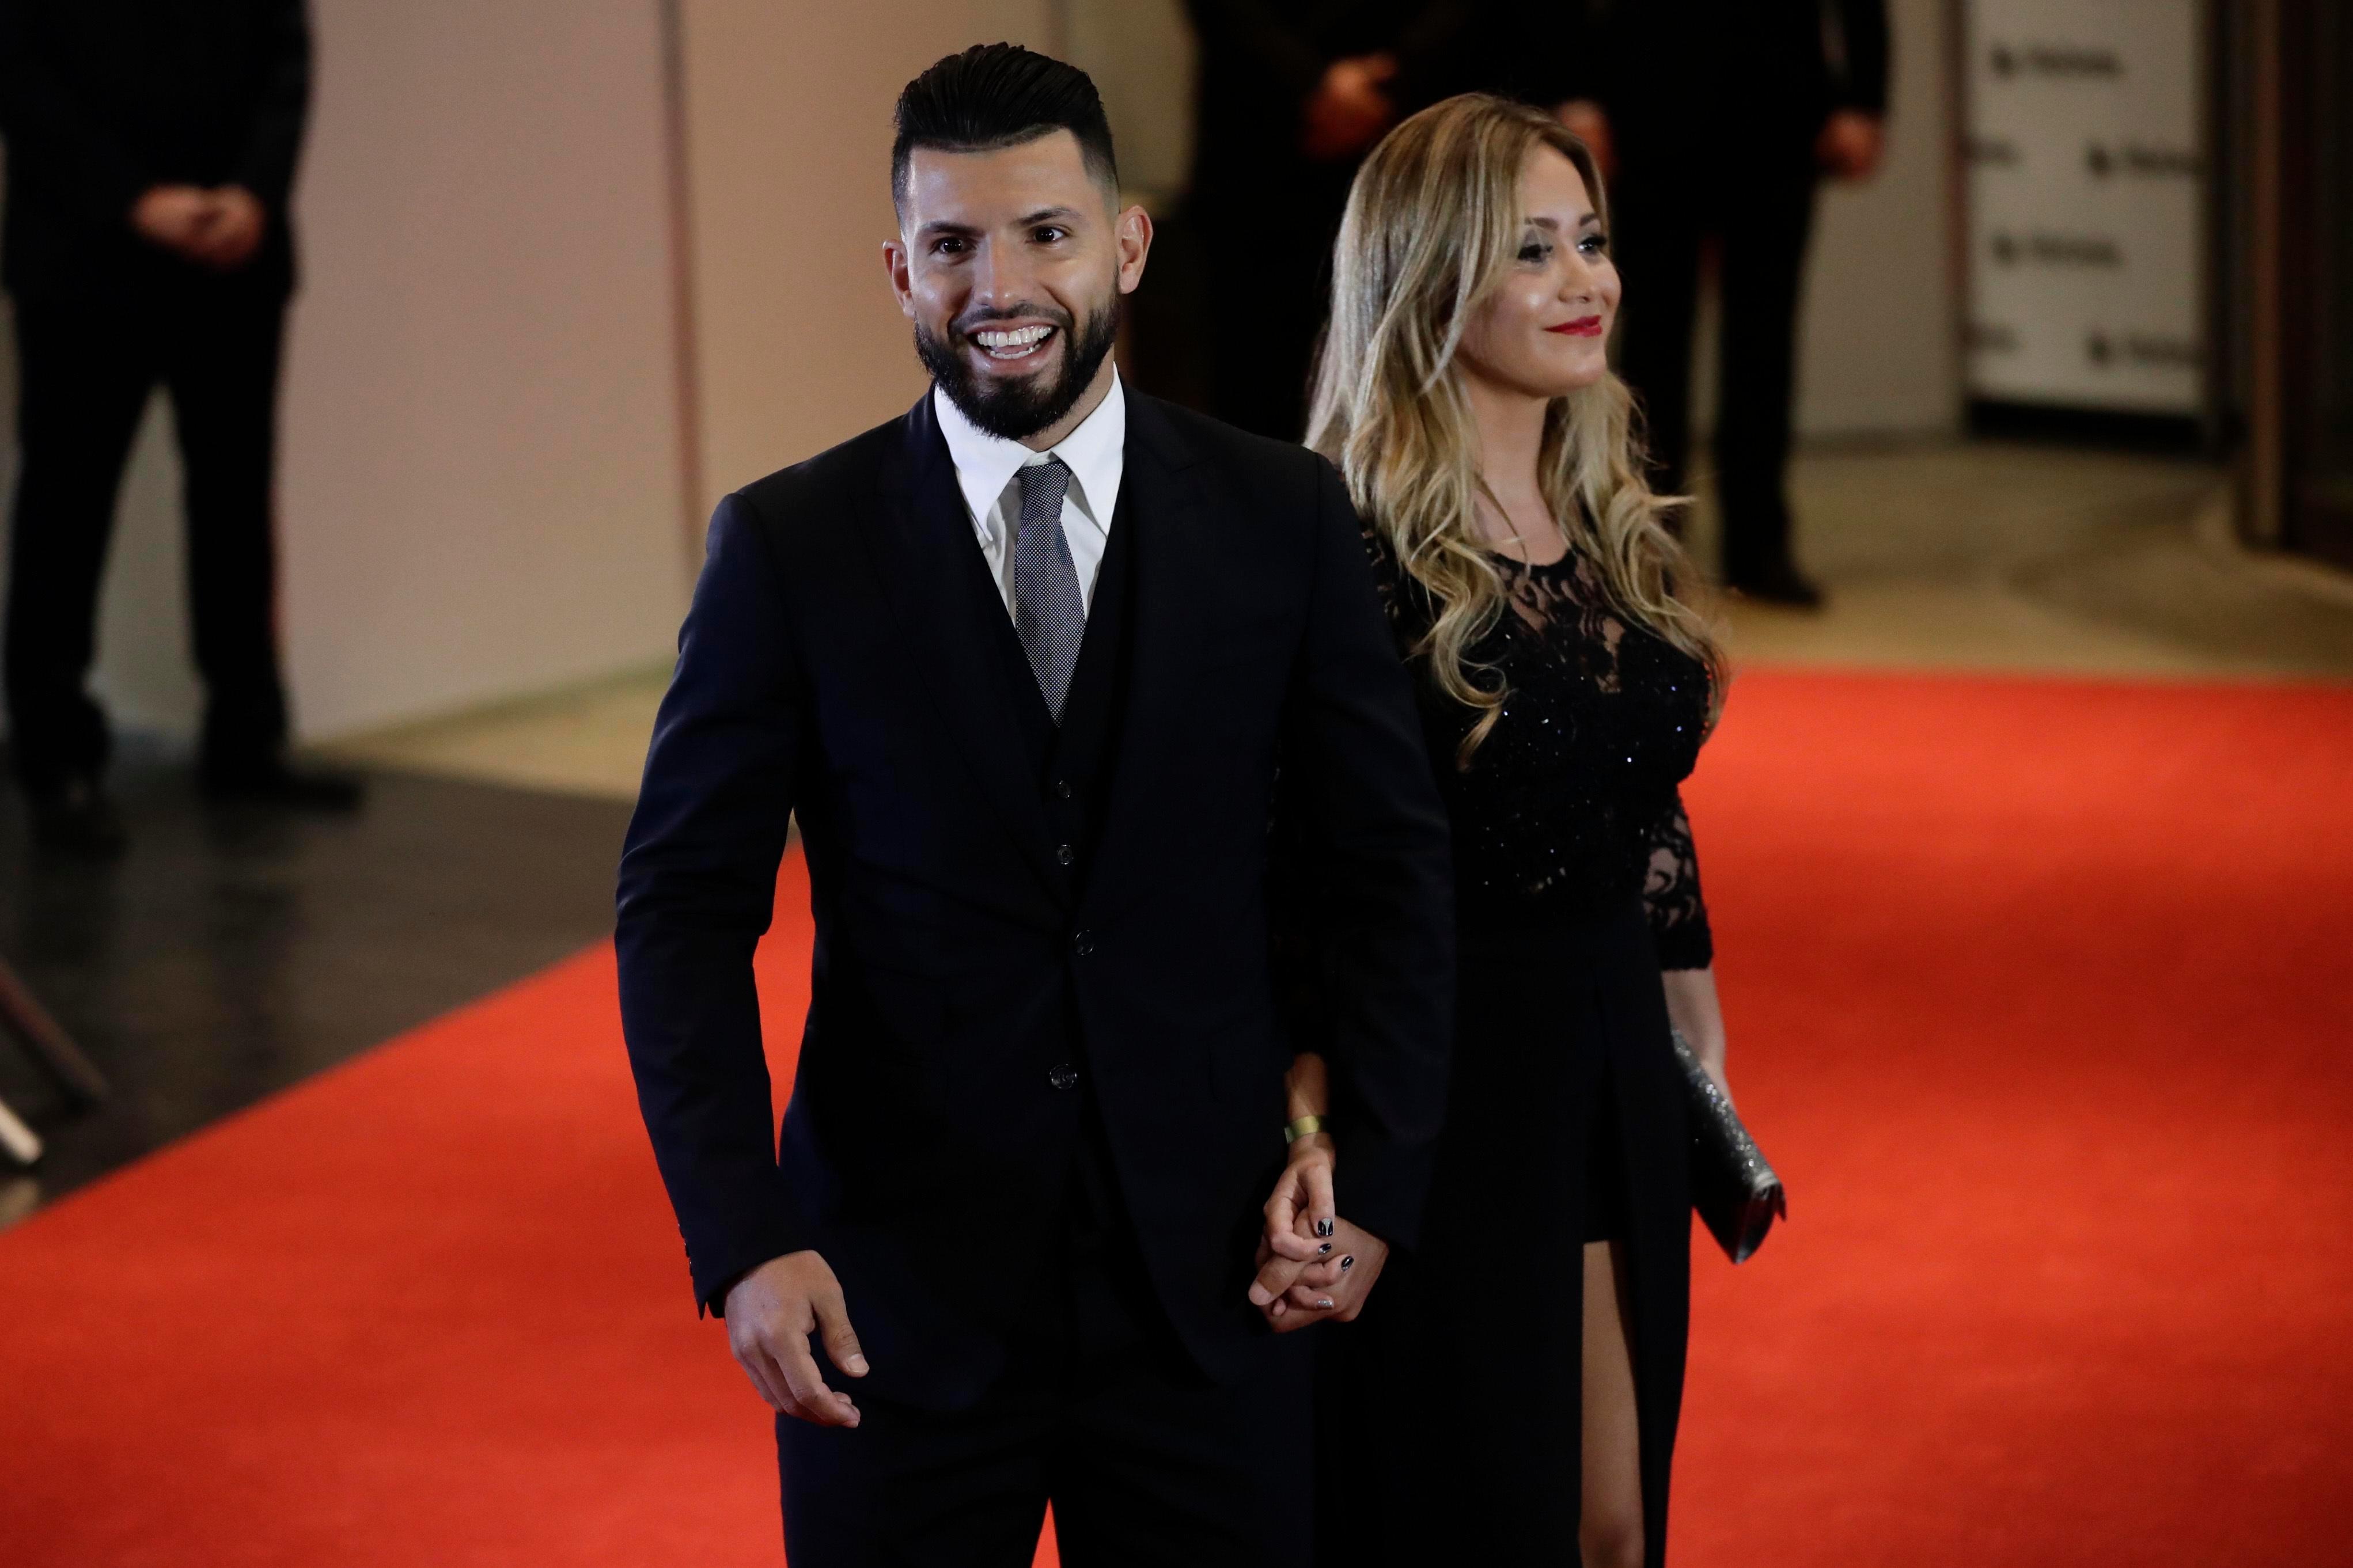 The superstar couple suffered an acrimonious split